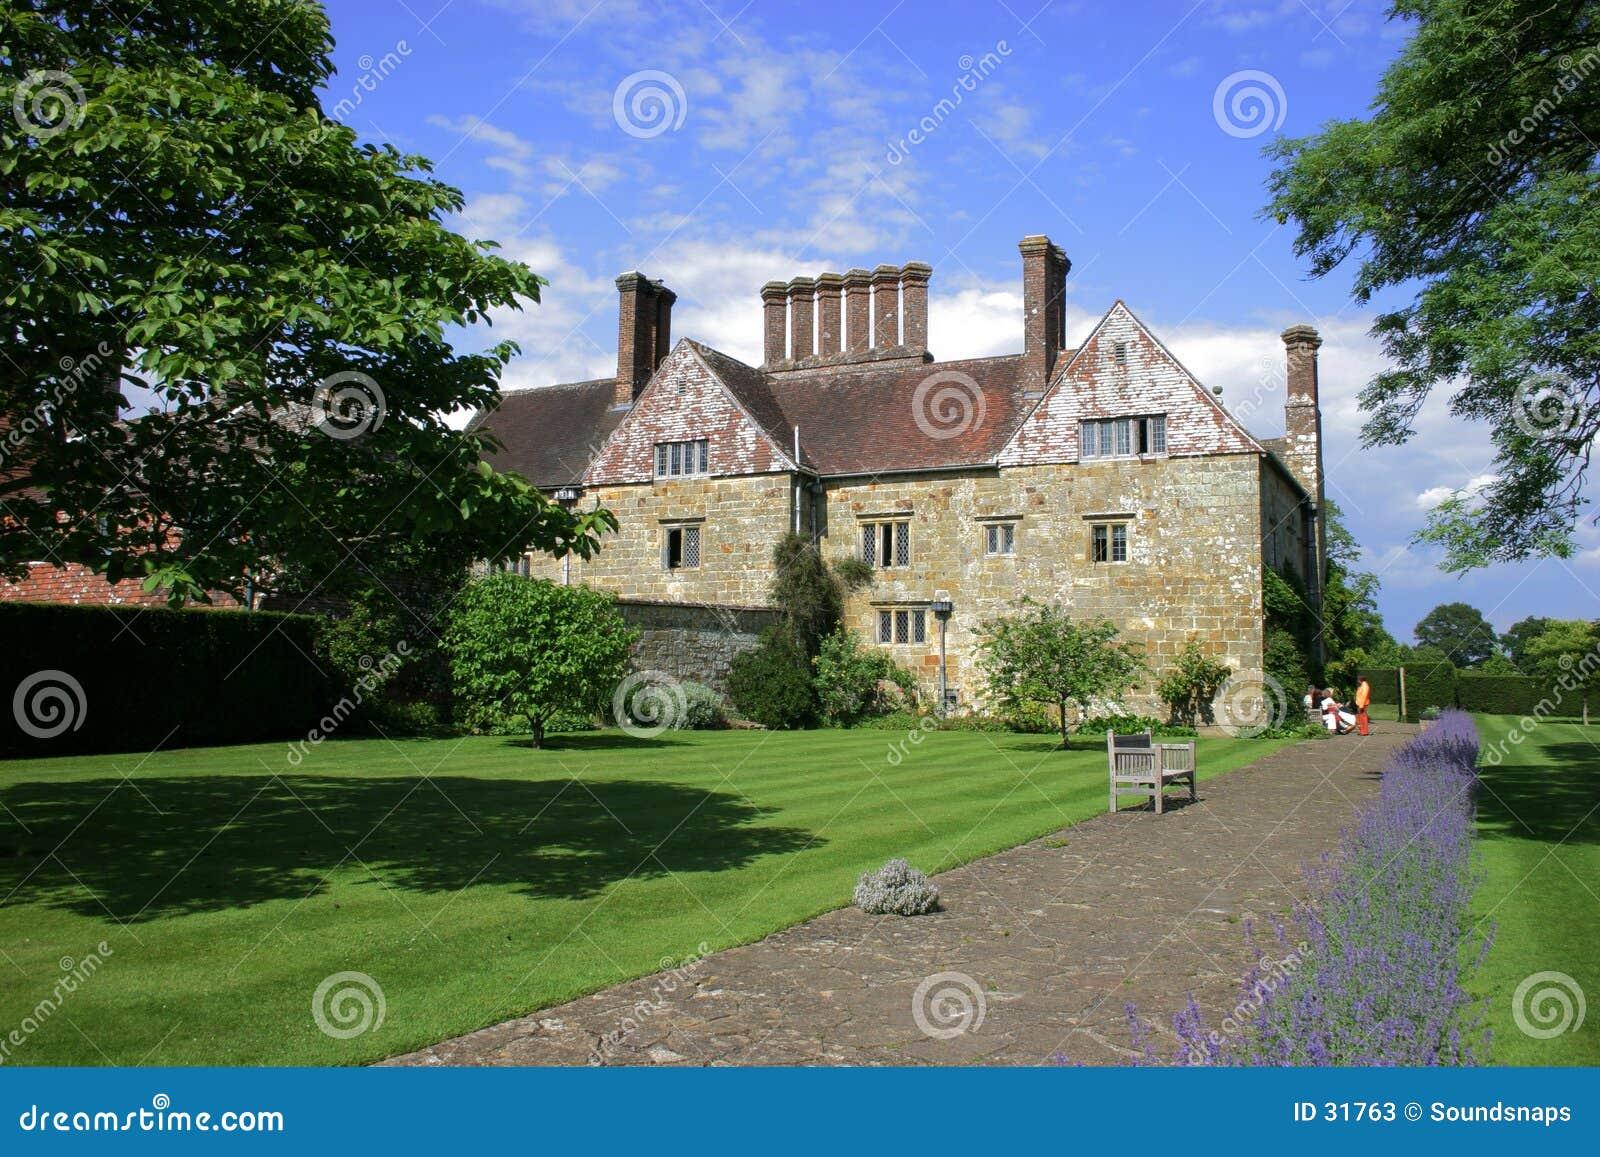 Maison de campagne anglaise